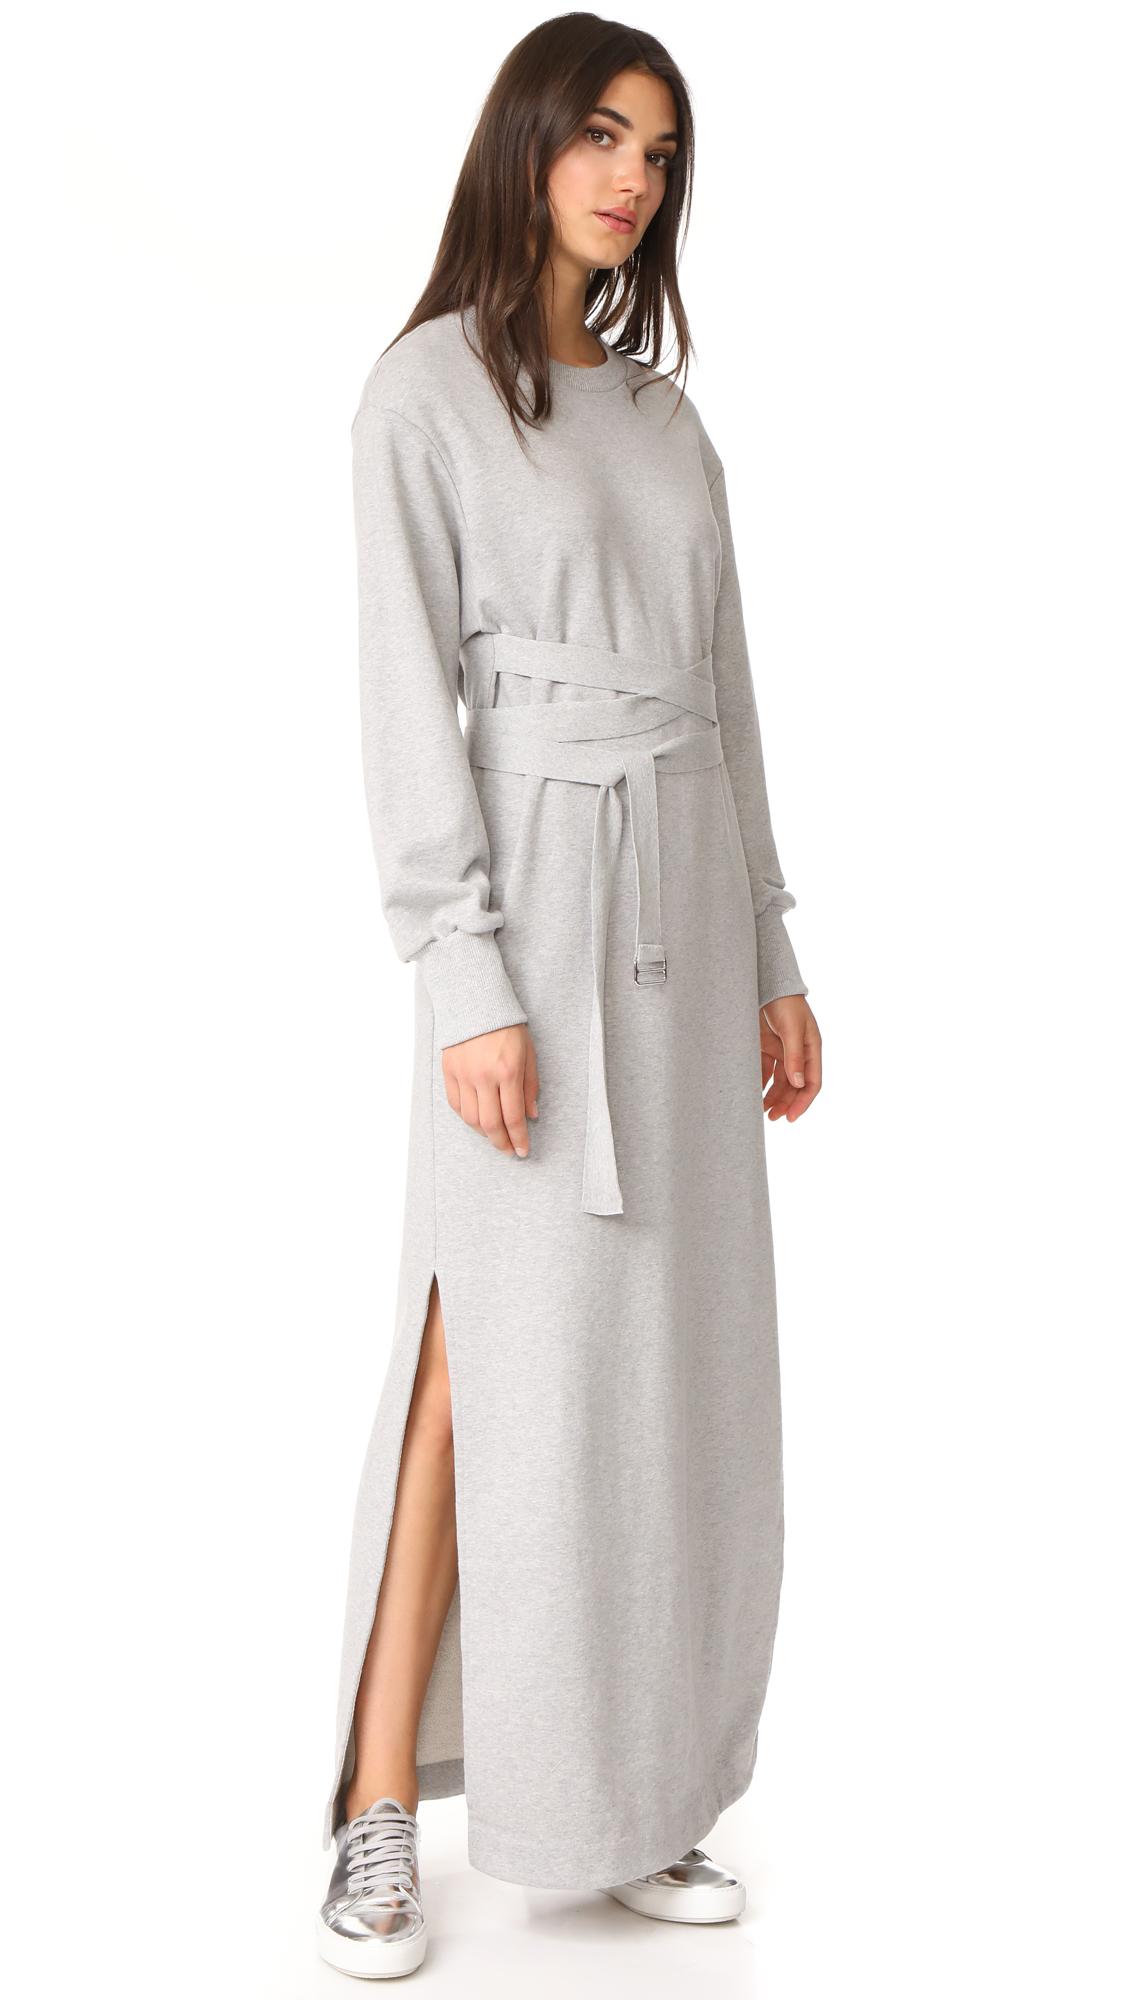 GOEN.J Maxi Dress